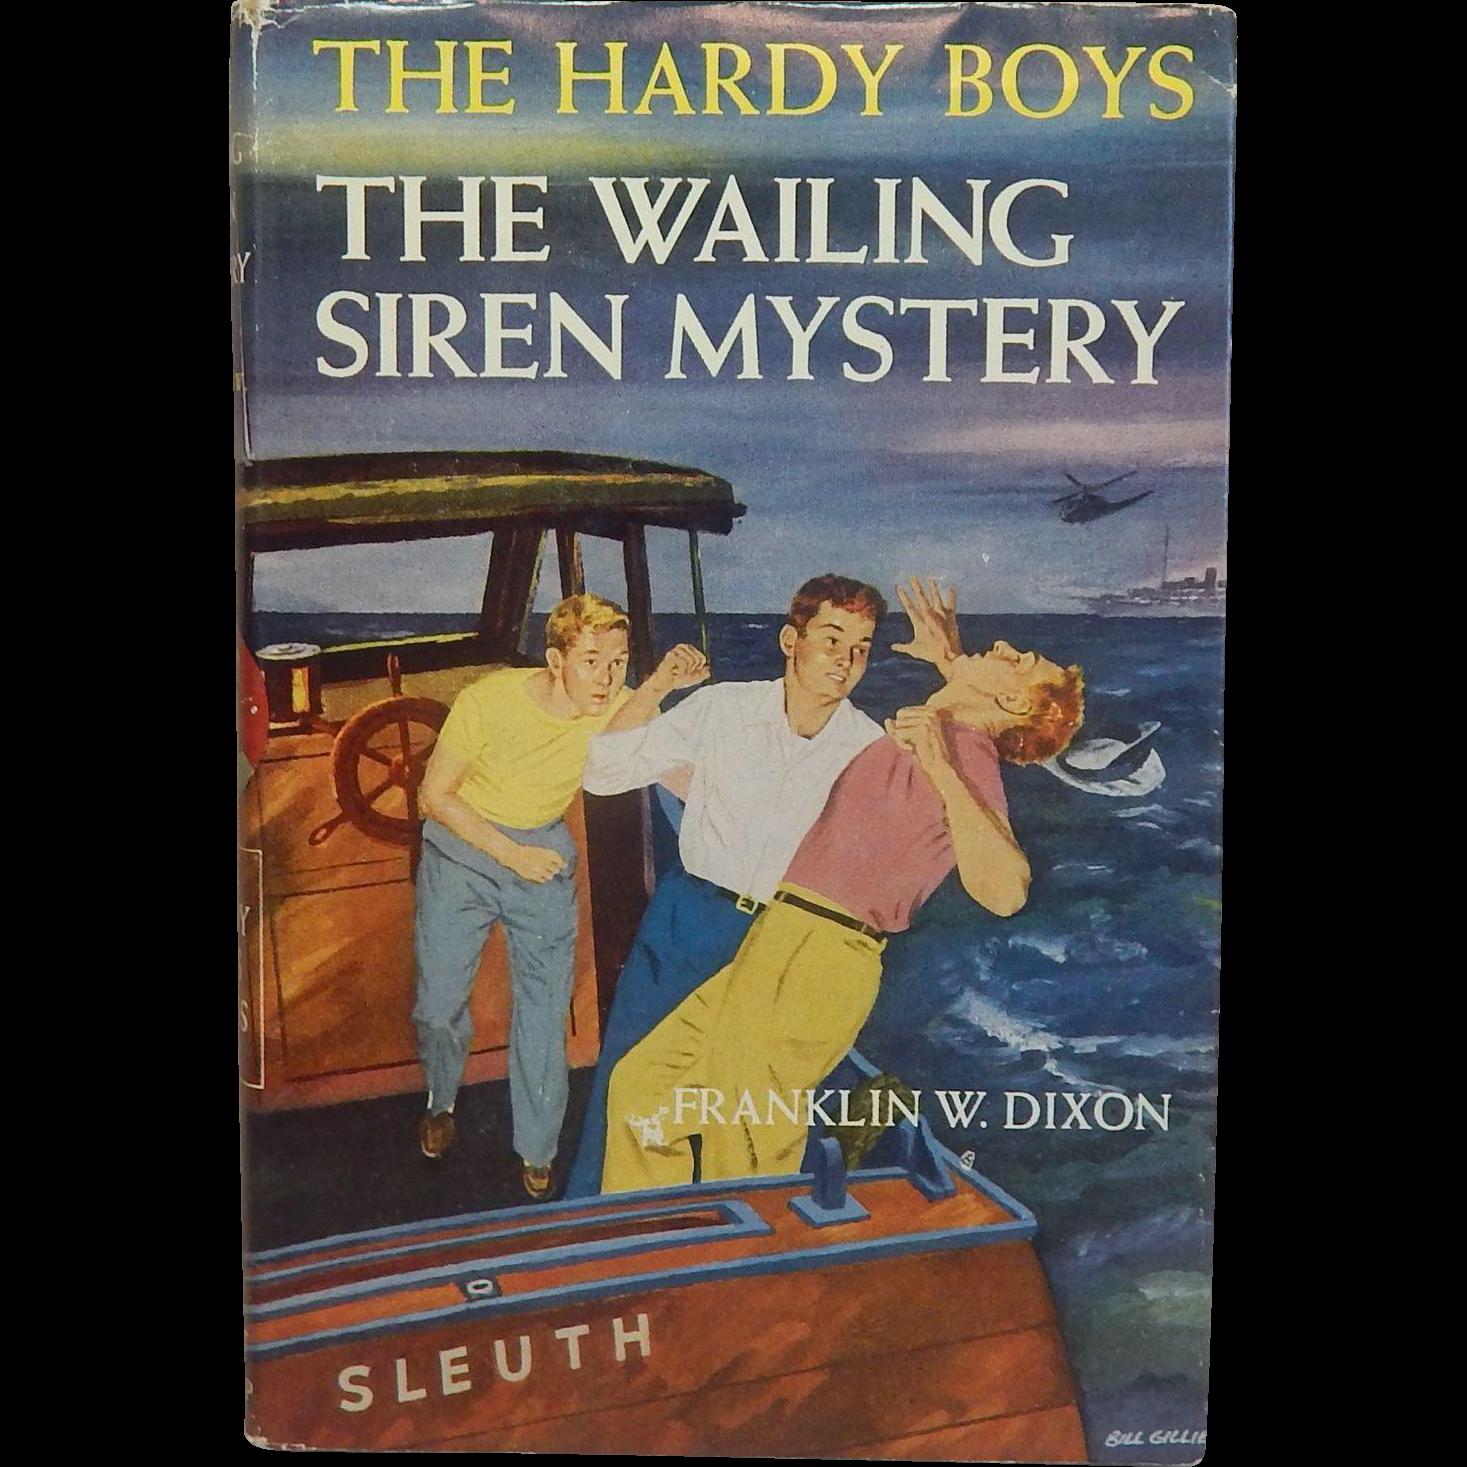 The Hardy Boys The Wailing Siren Mystery #30